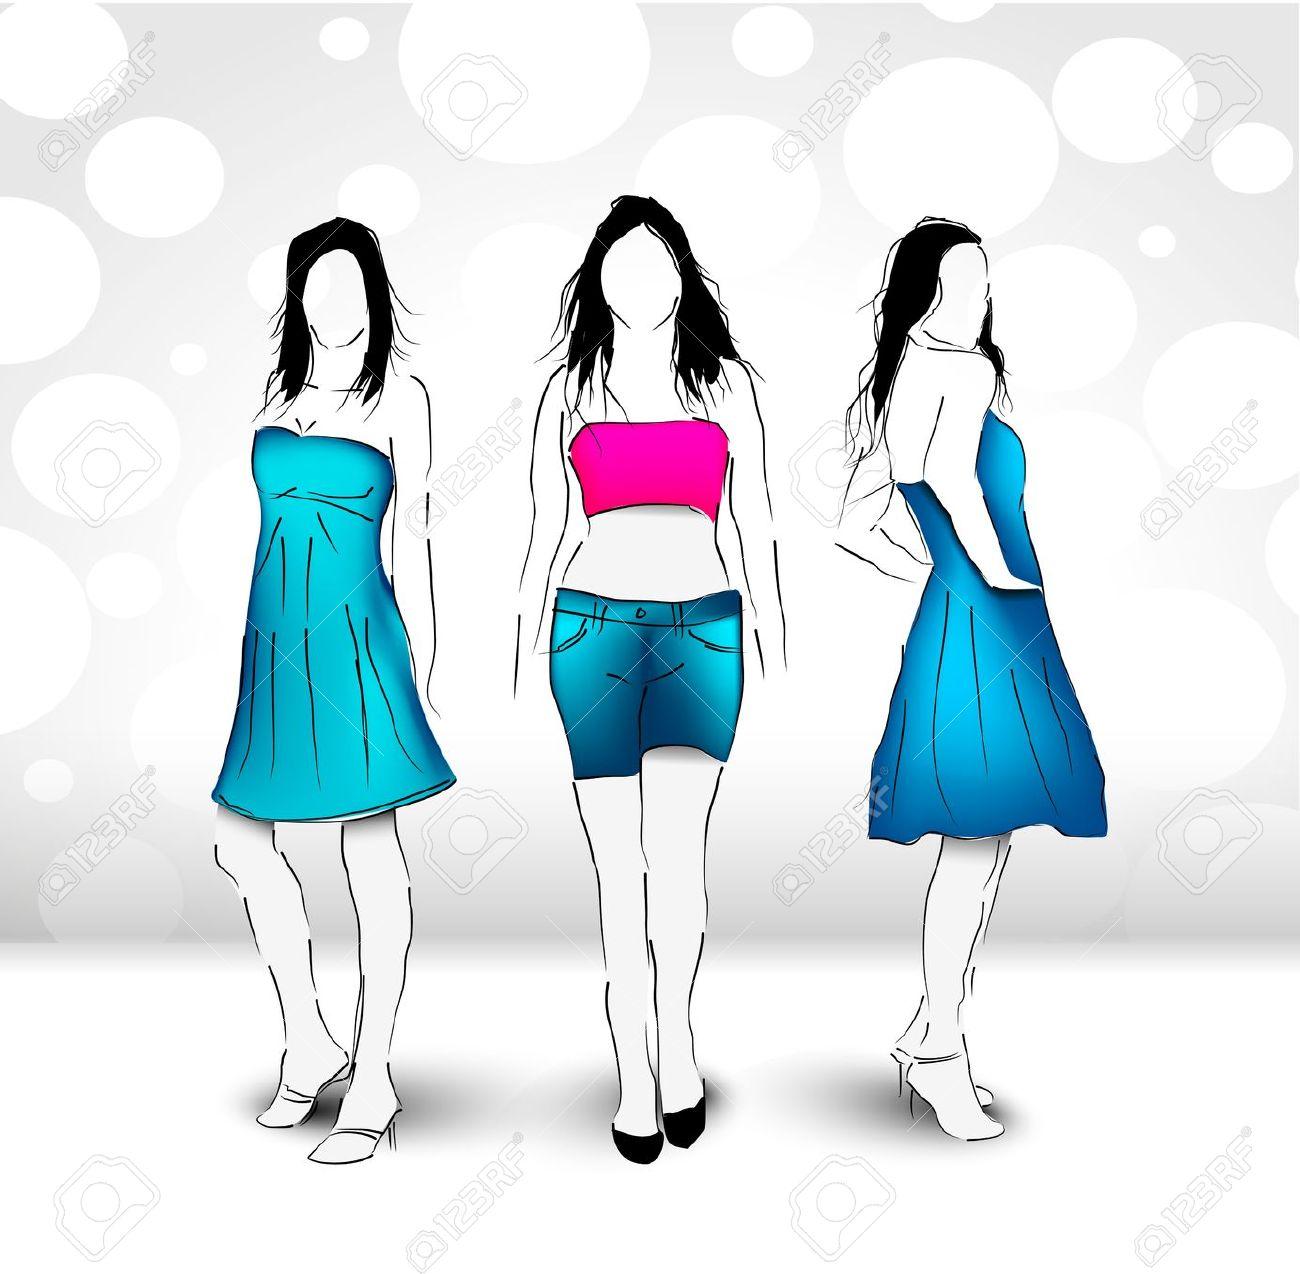 Fashion Women Vector Illustration Royalty Free Cliparts, Vectors.